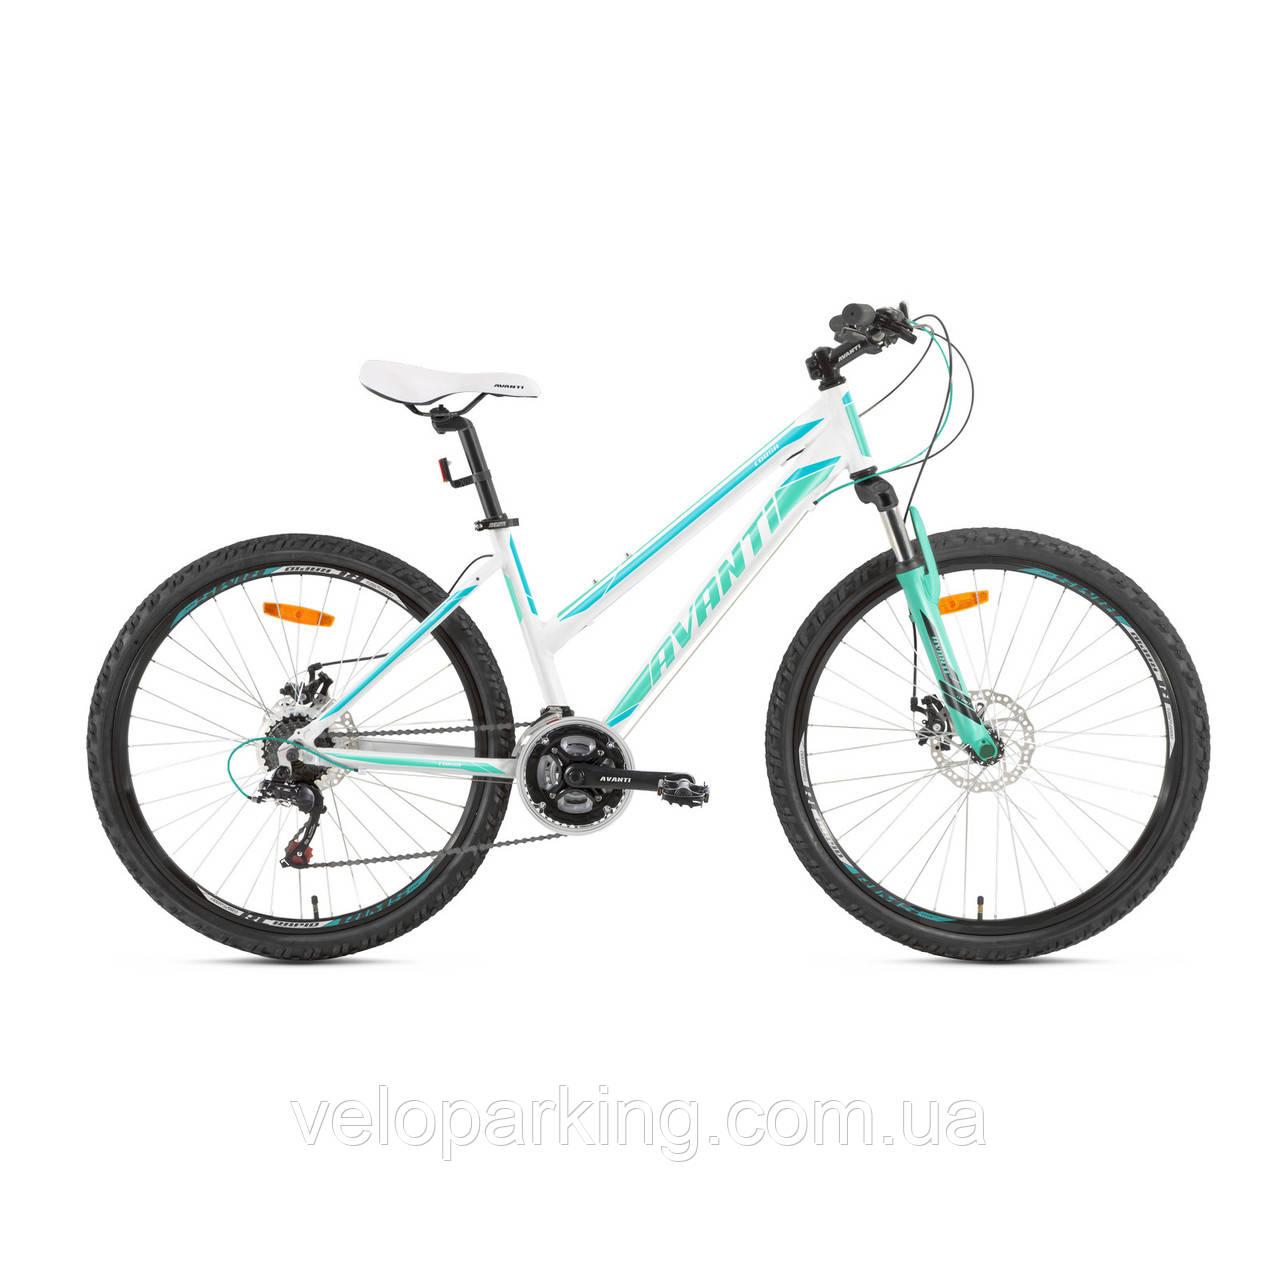 Горный дамский велосипед Avanti Corsa 26 (2018) DD new